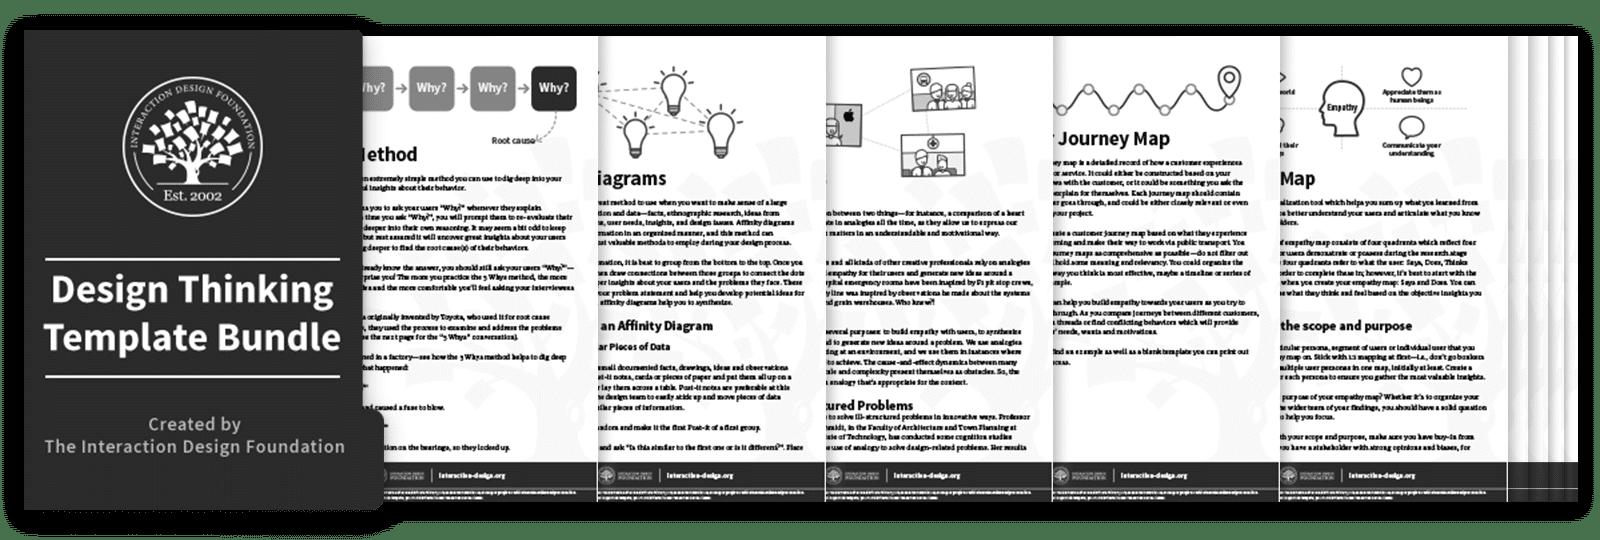 Bundle of 17 Design Thinking 2020 templates